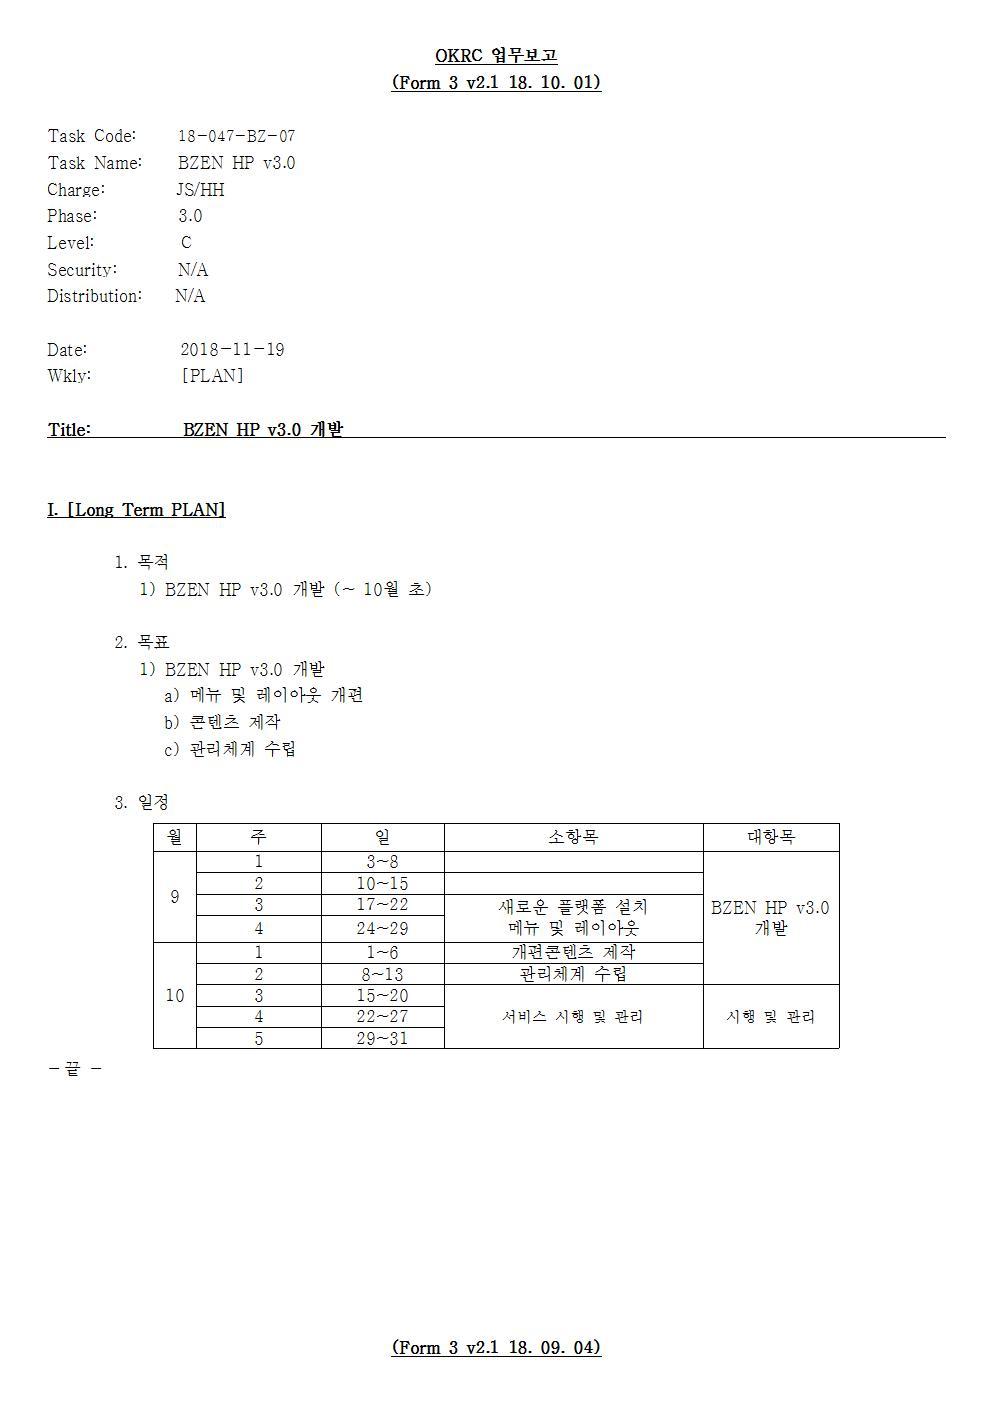 D-[18-047-BZ-07]-[BZEN HP v3.0]-[2018-11-19][HH]001.jpg